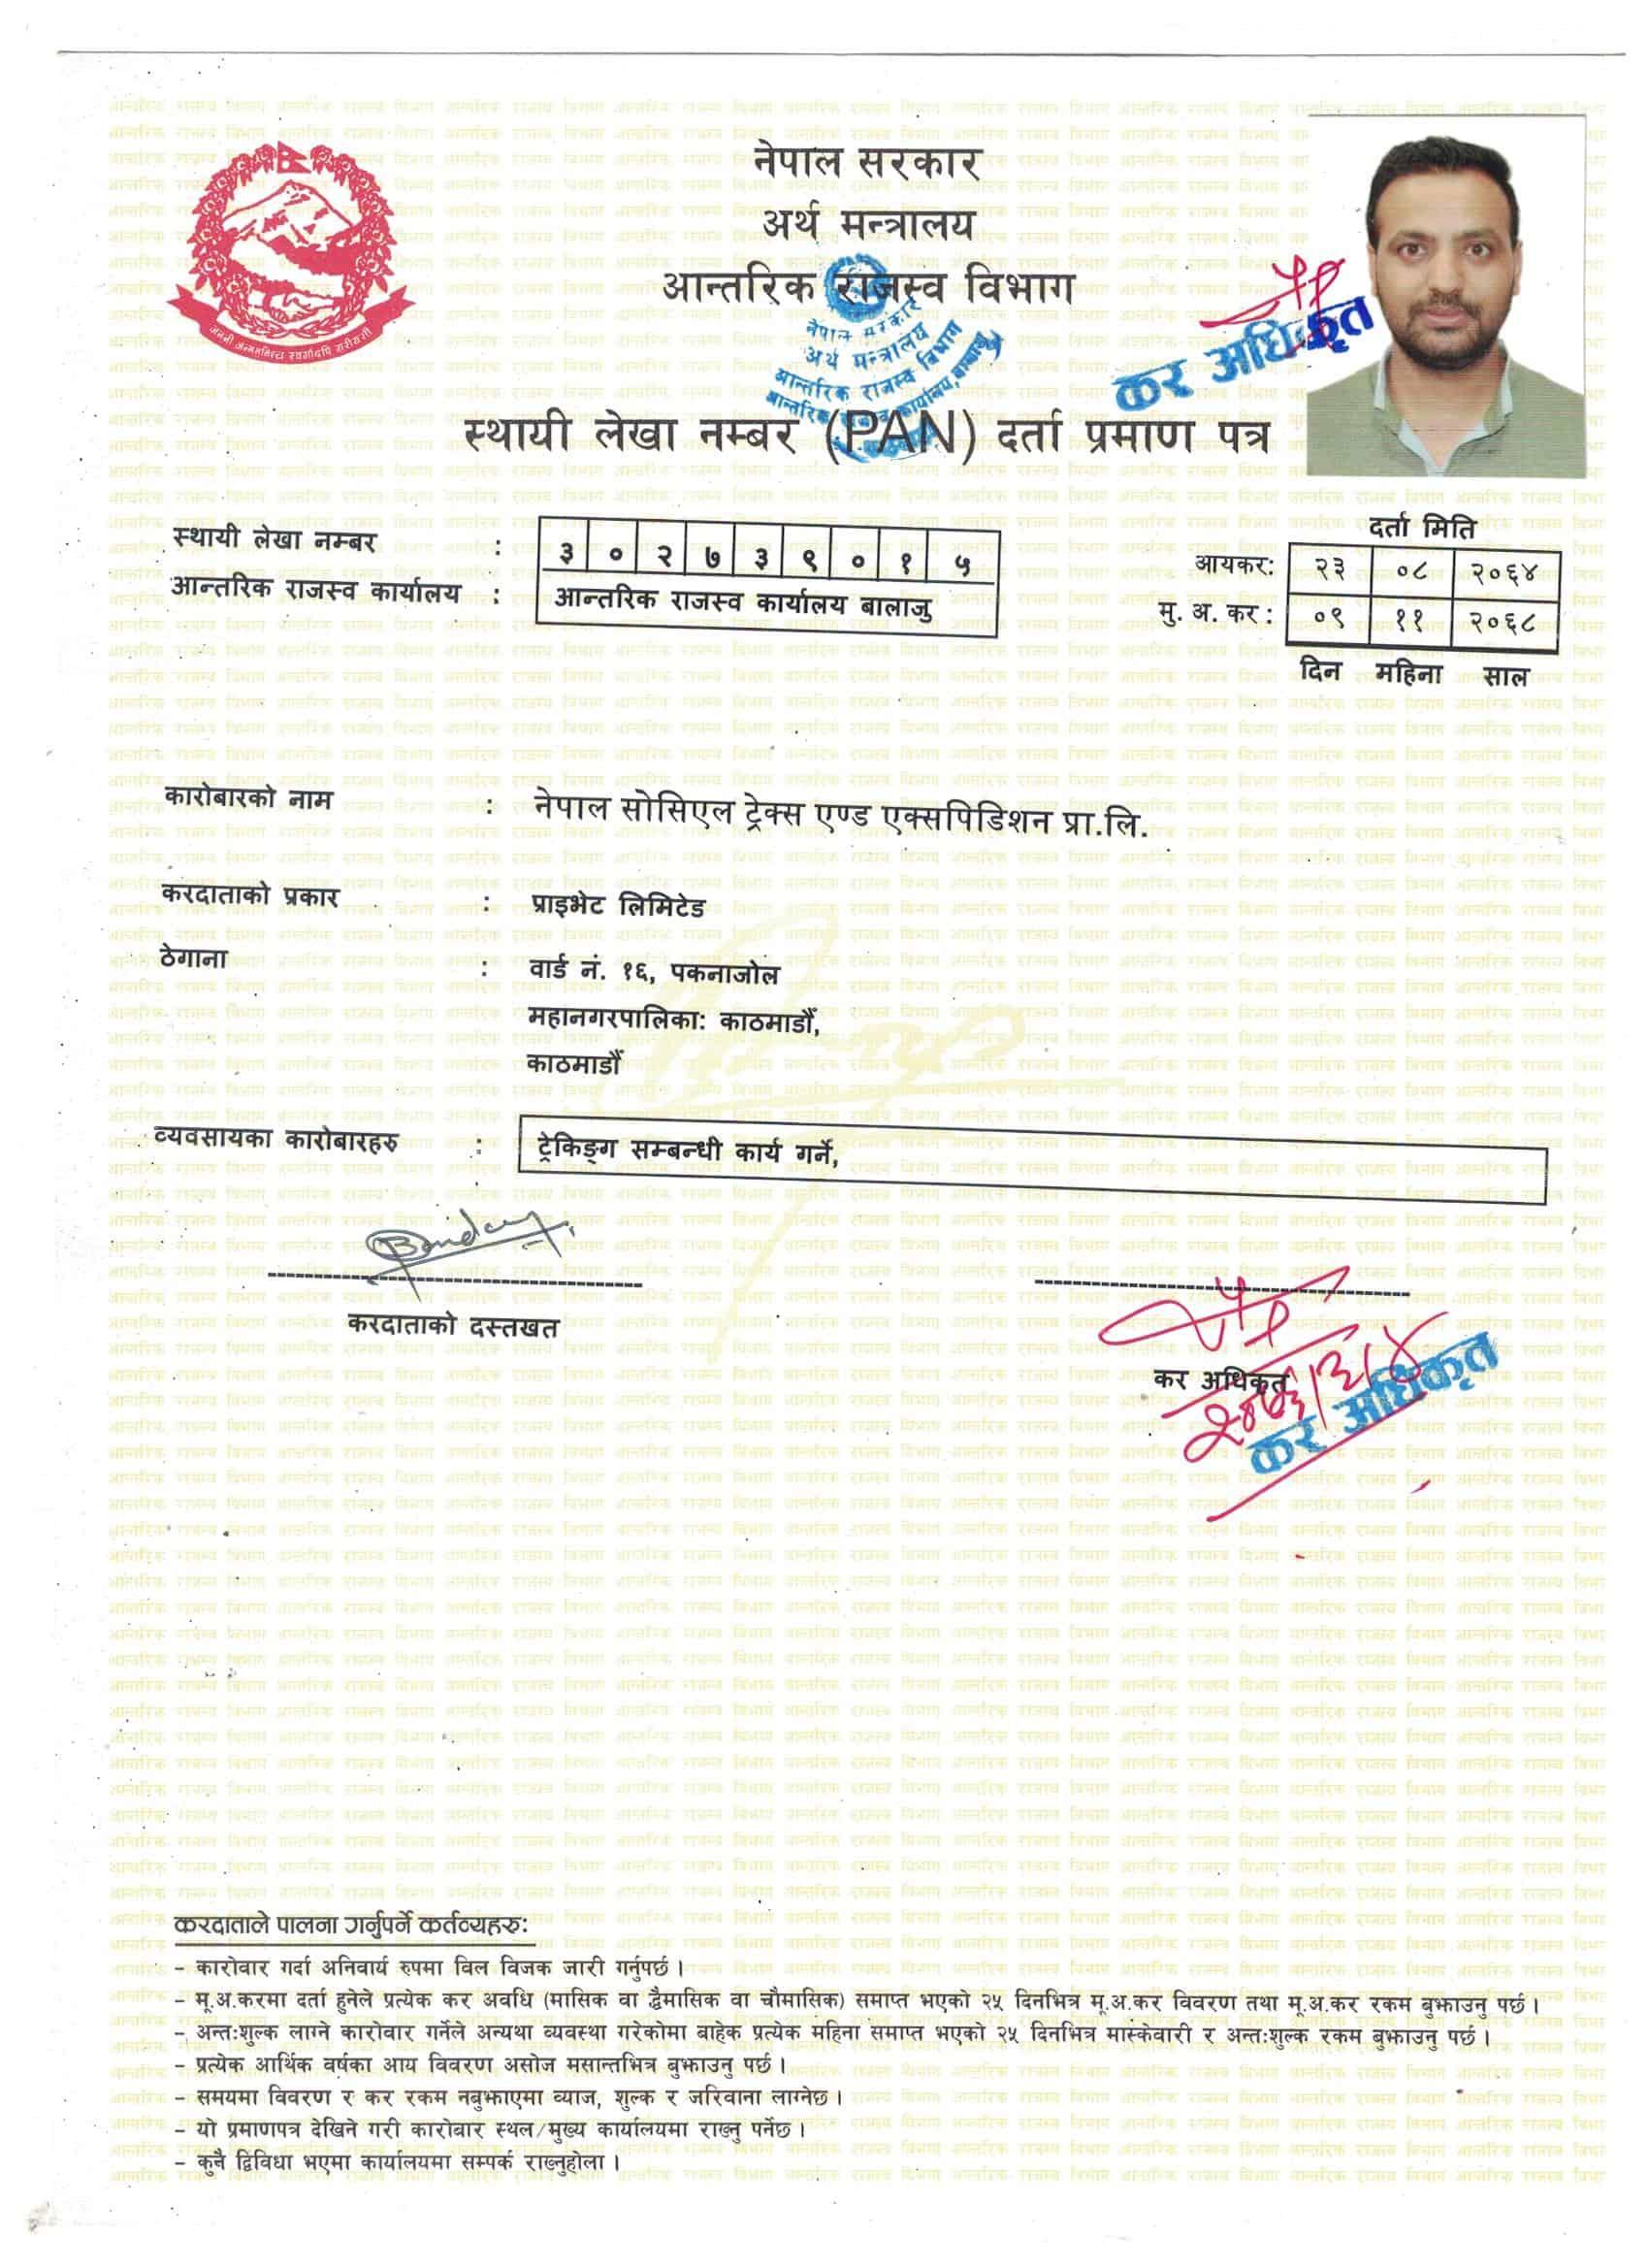 Nepal Gov. Tax Registration